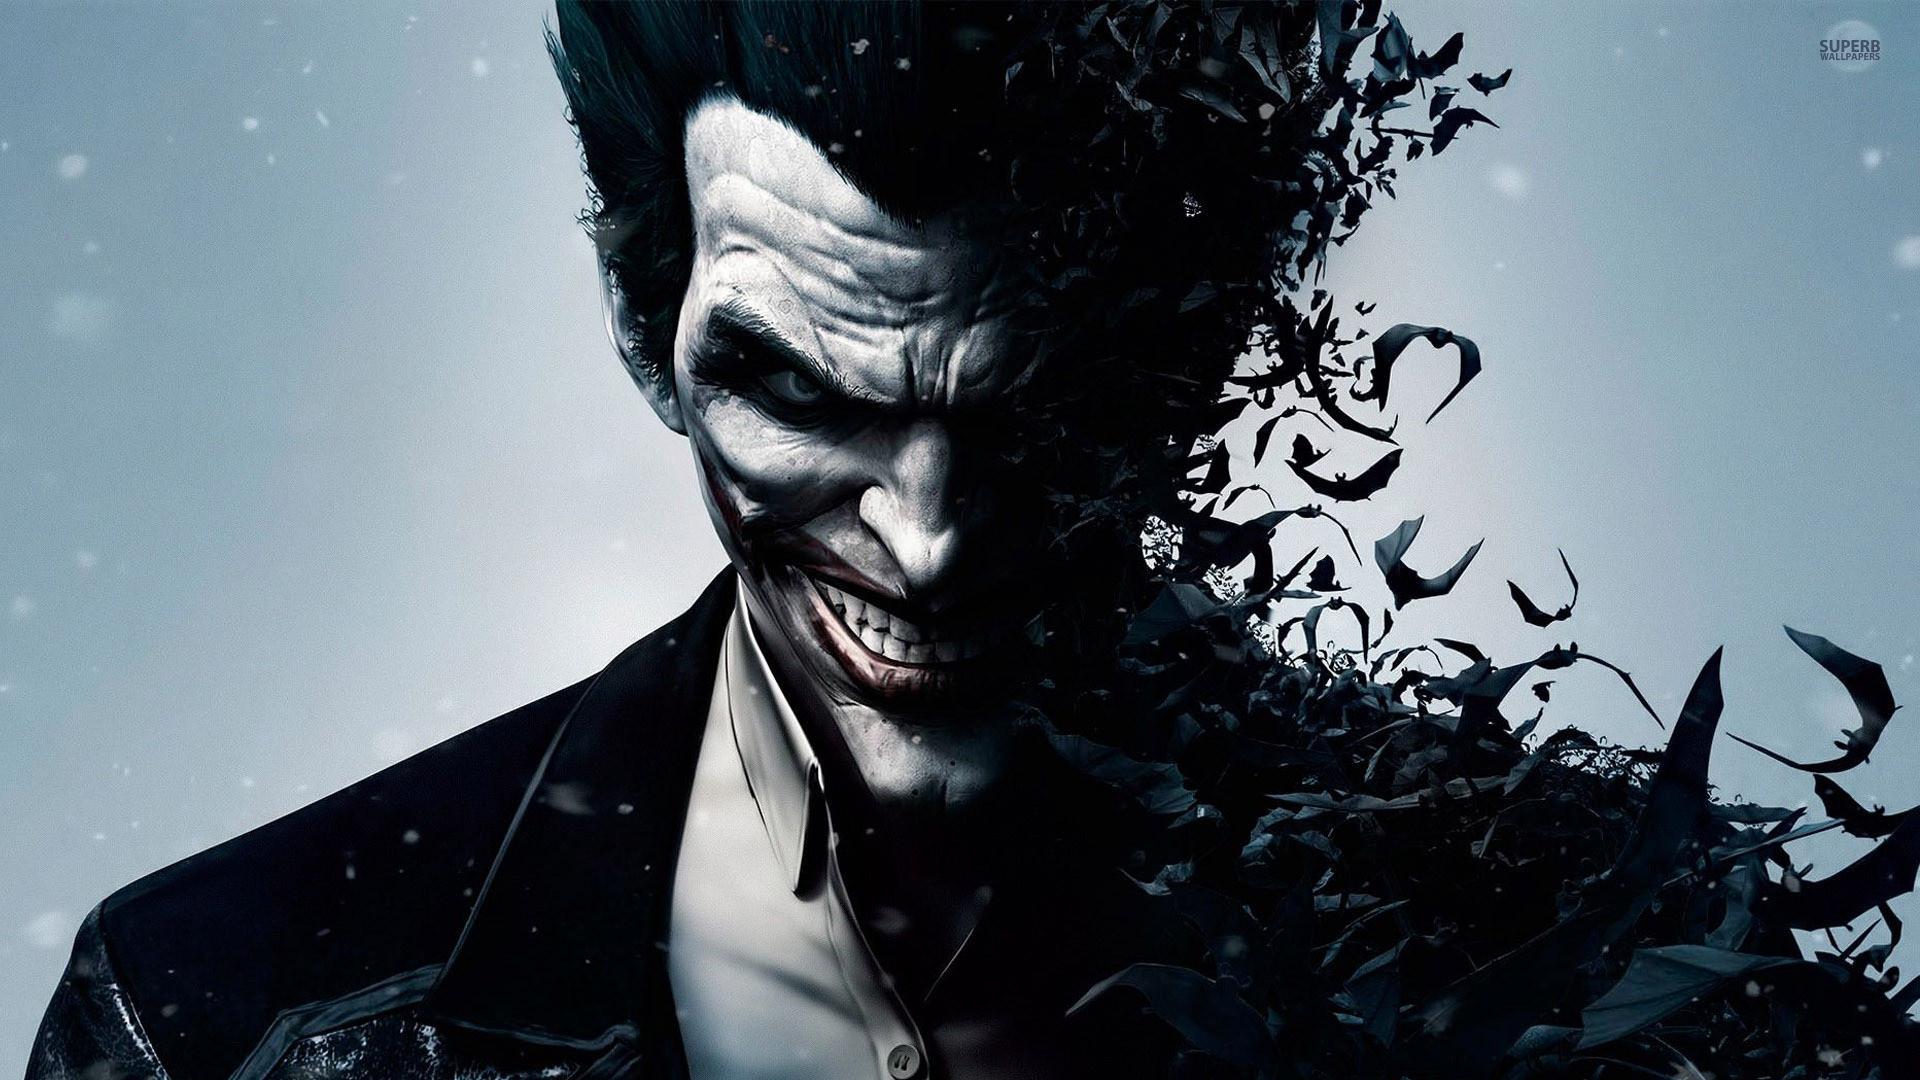 batman arkham origins   Joker Batman Arkham Origins Wallpaper – HD  Wallpapers